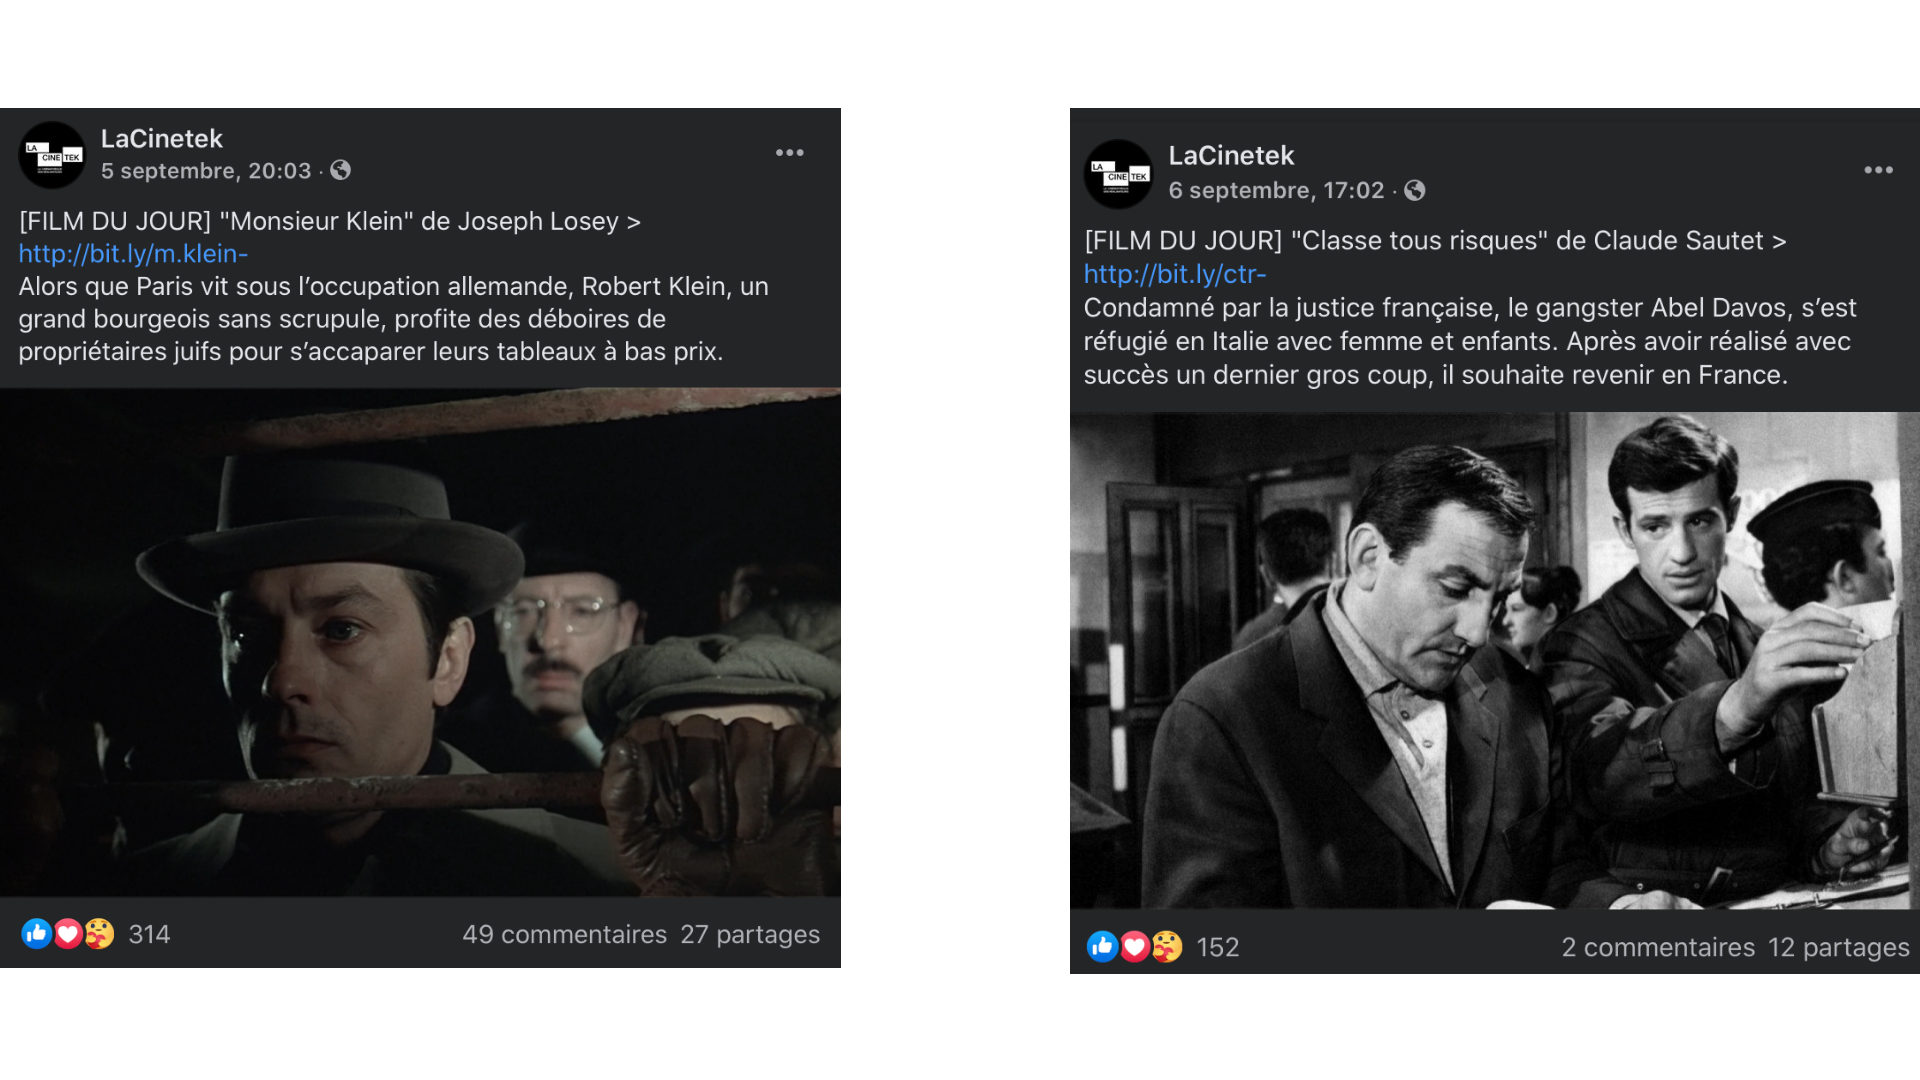 LaCinetek social network screens